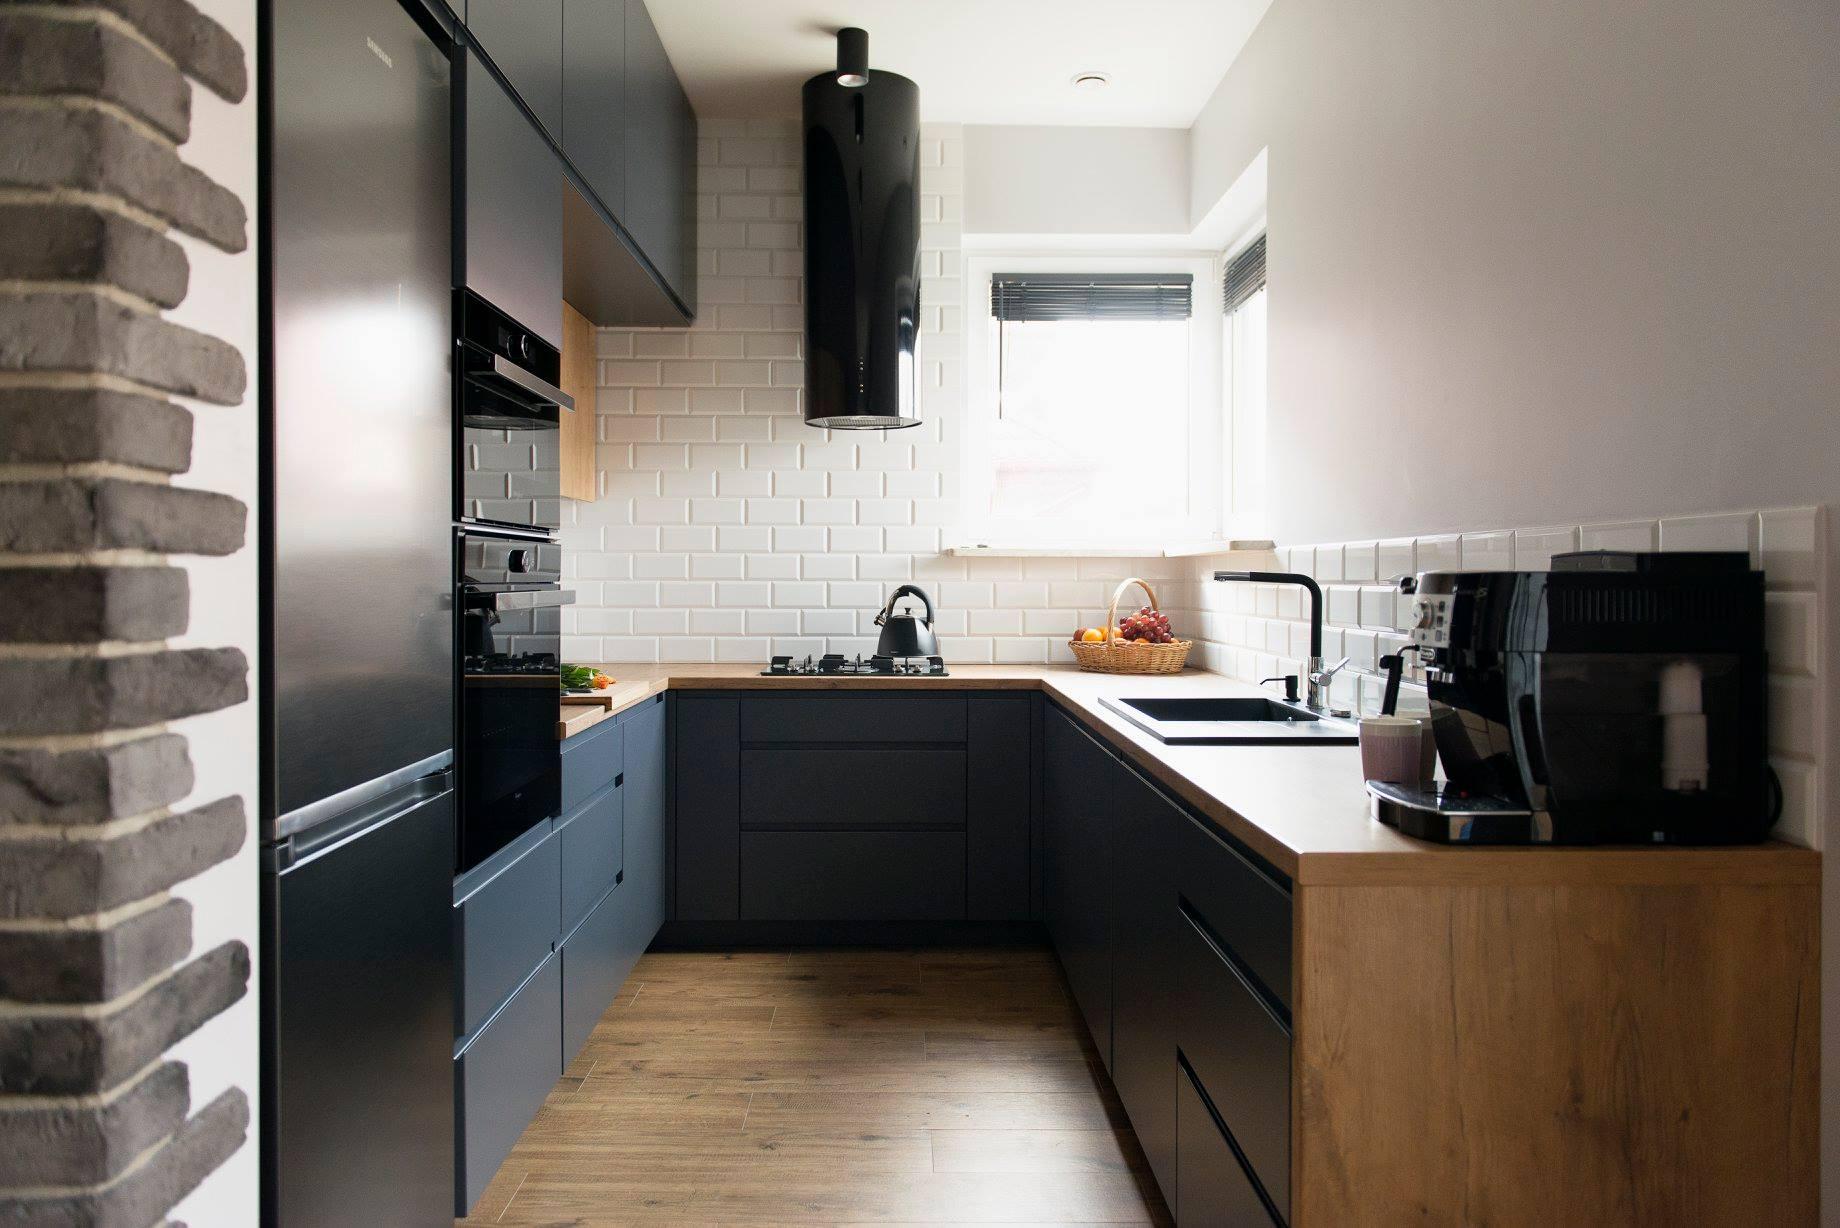 Kuchnia ciemna szarość z drewnem